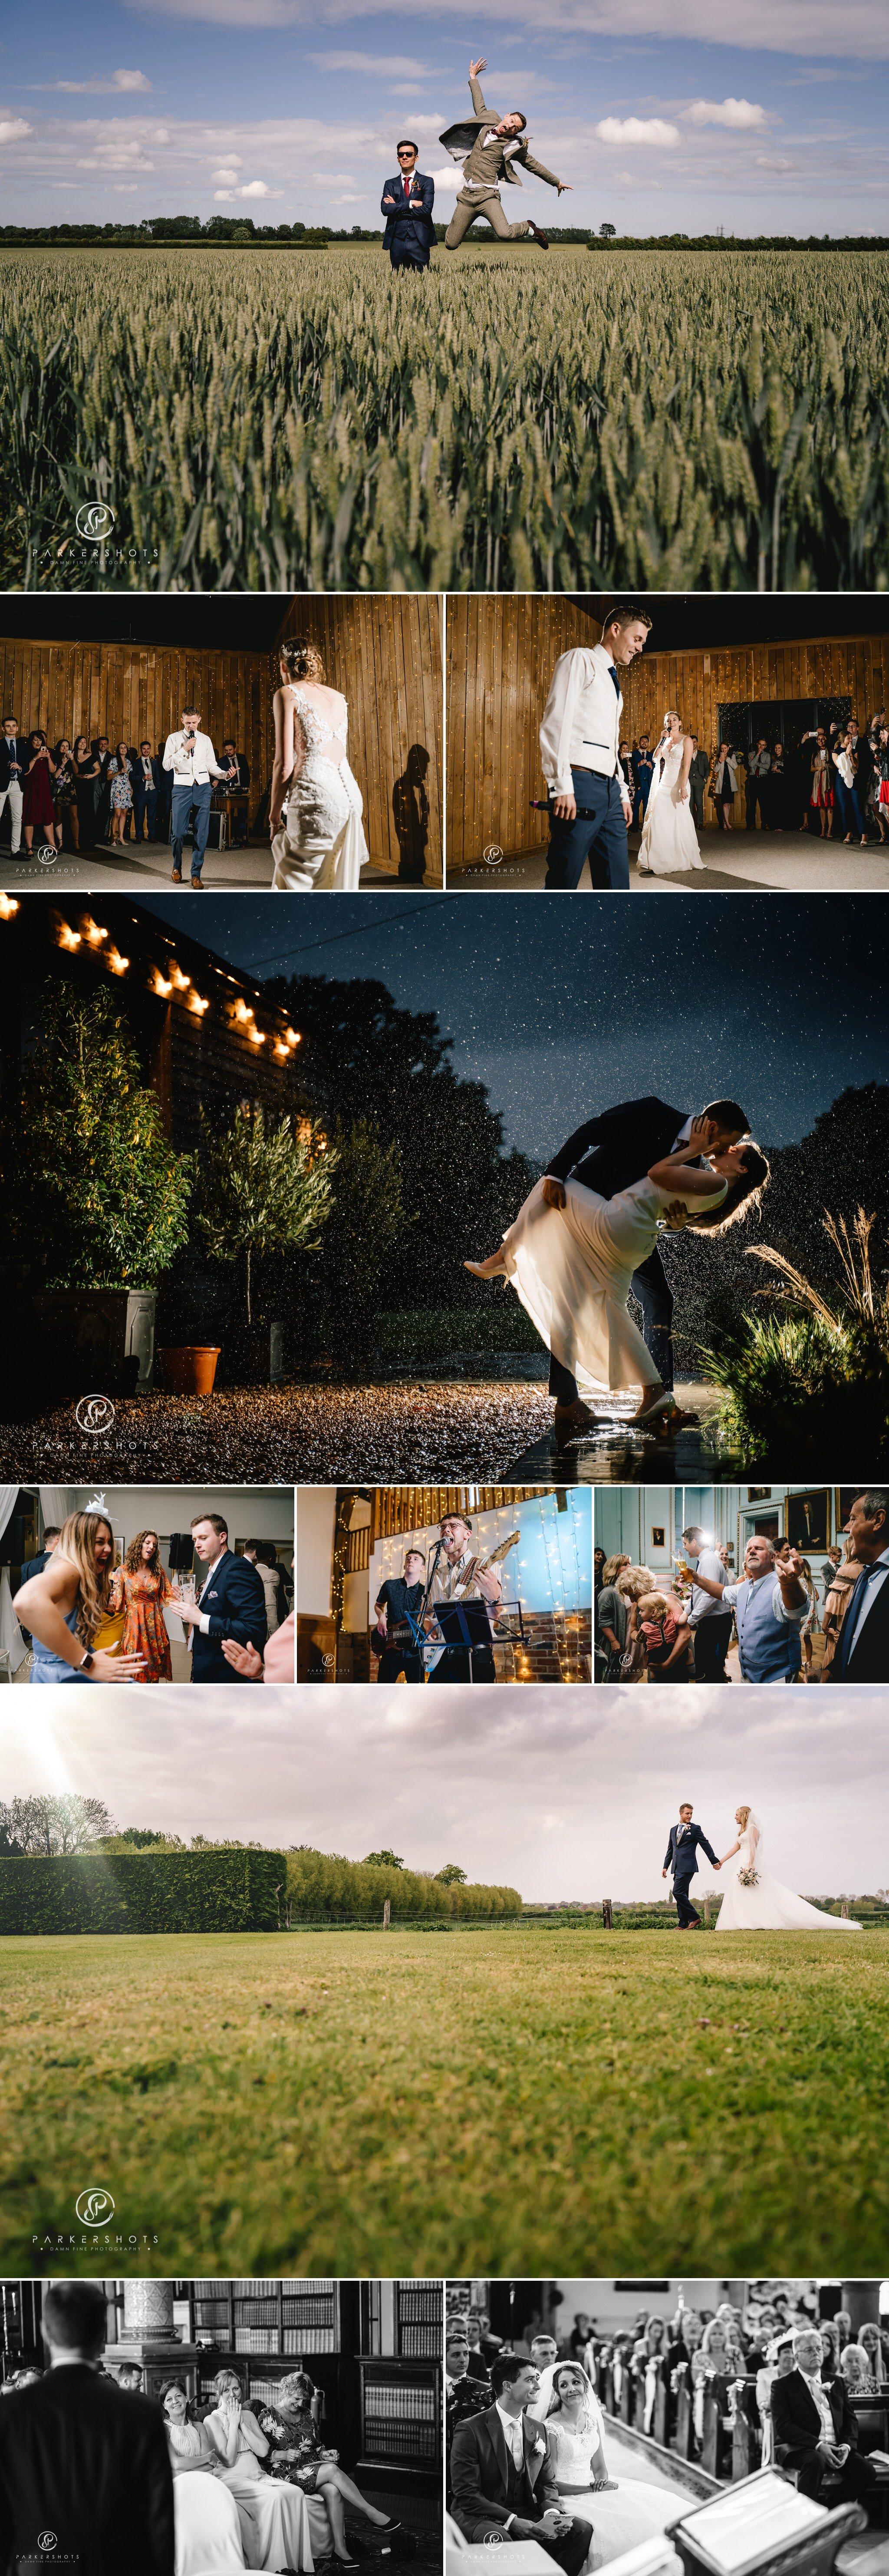 Best of Alternative Wedding Photography 2019